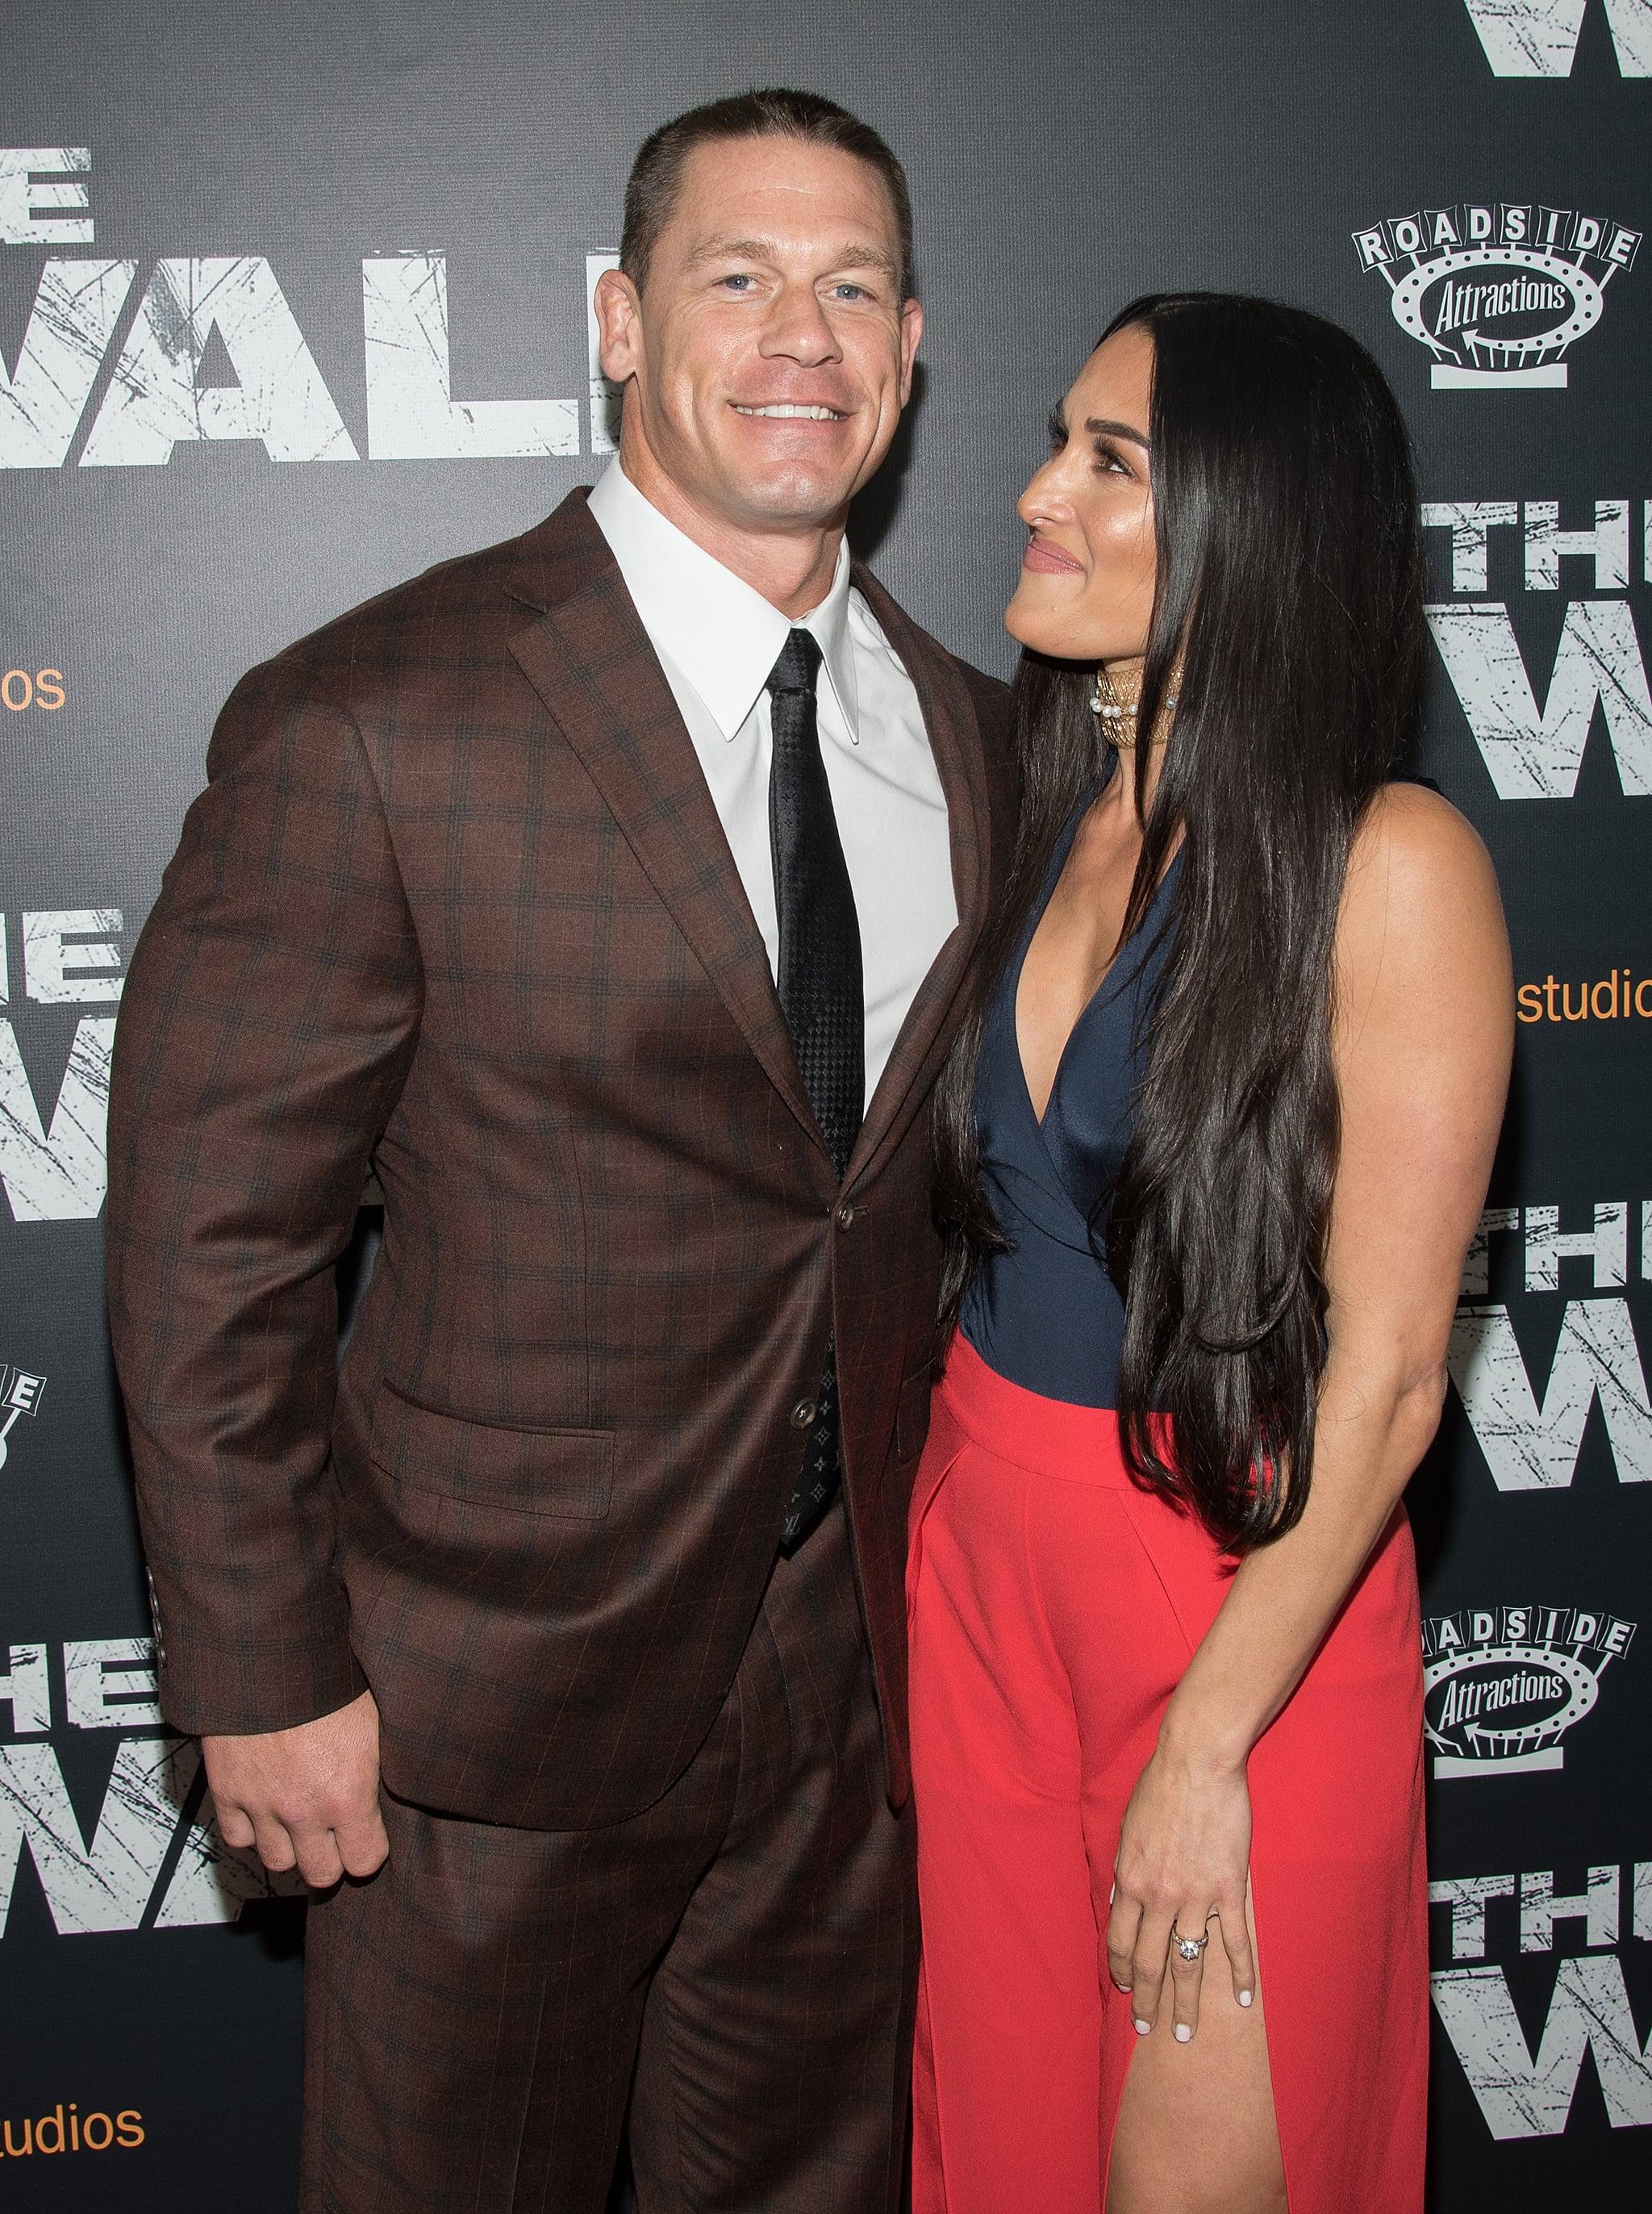 John Cena POPSUGAR Interview August 2017 | POPSUGAR Celebrity